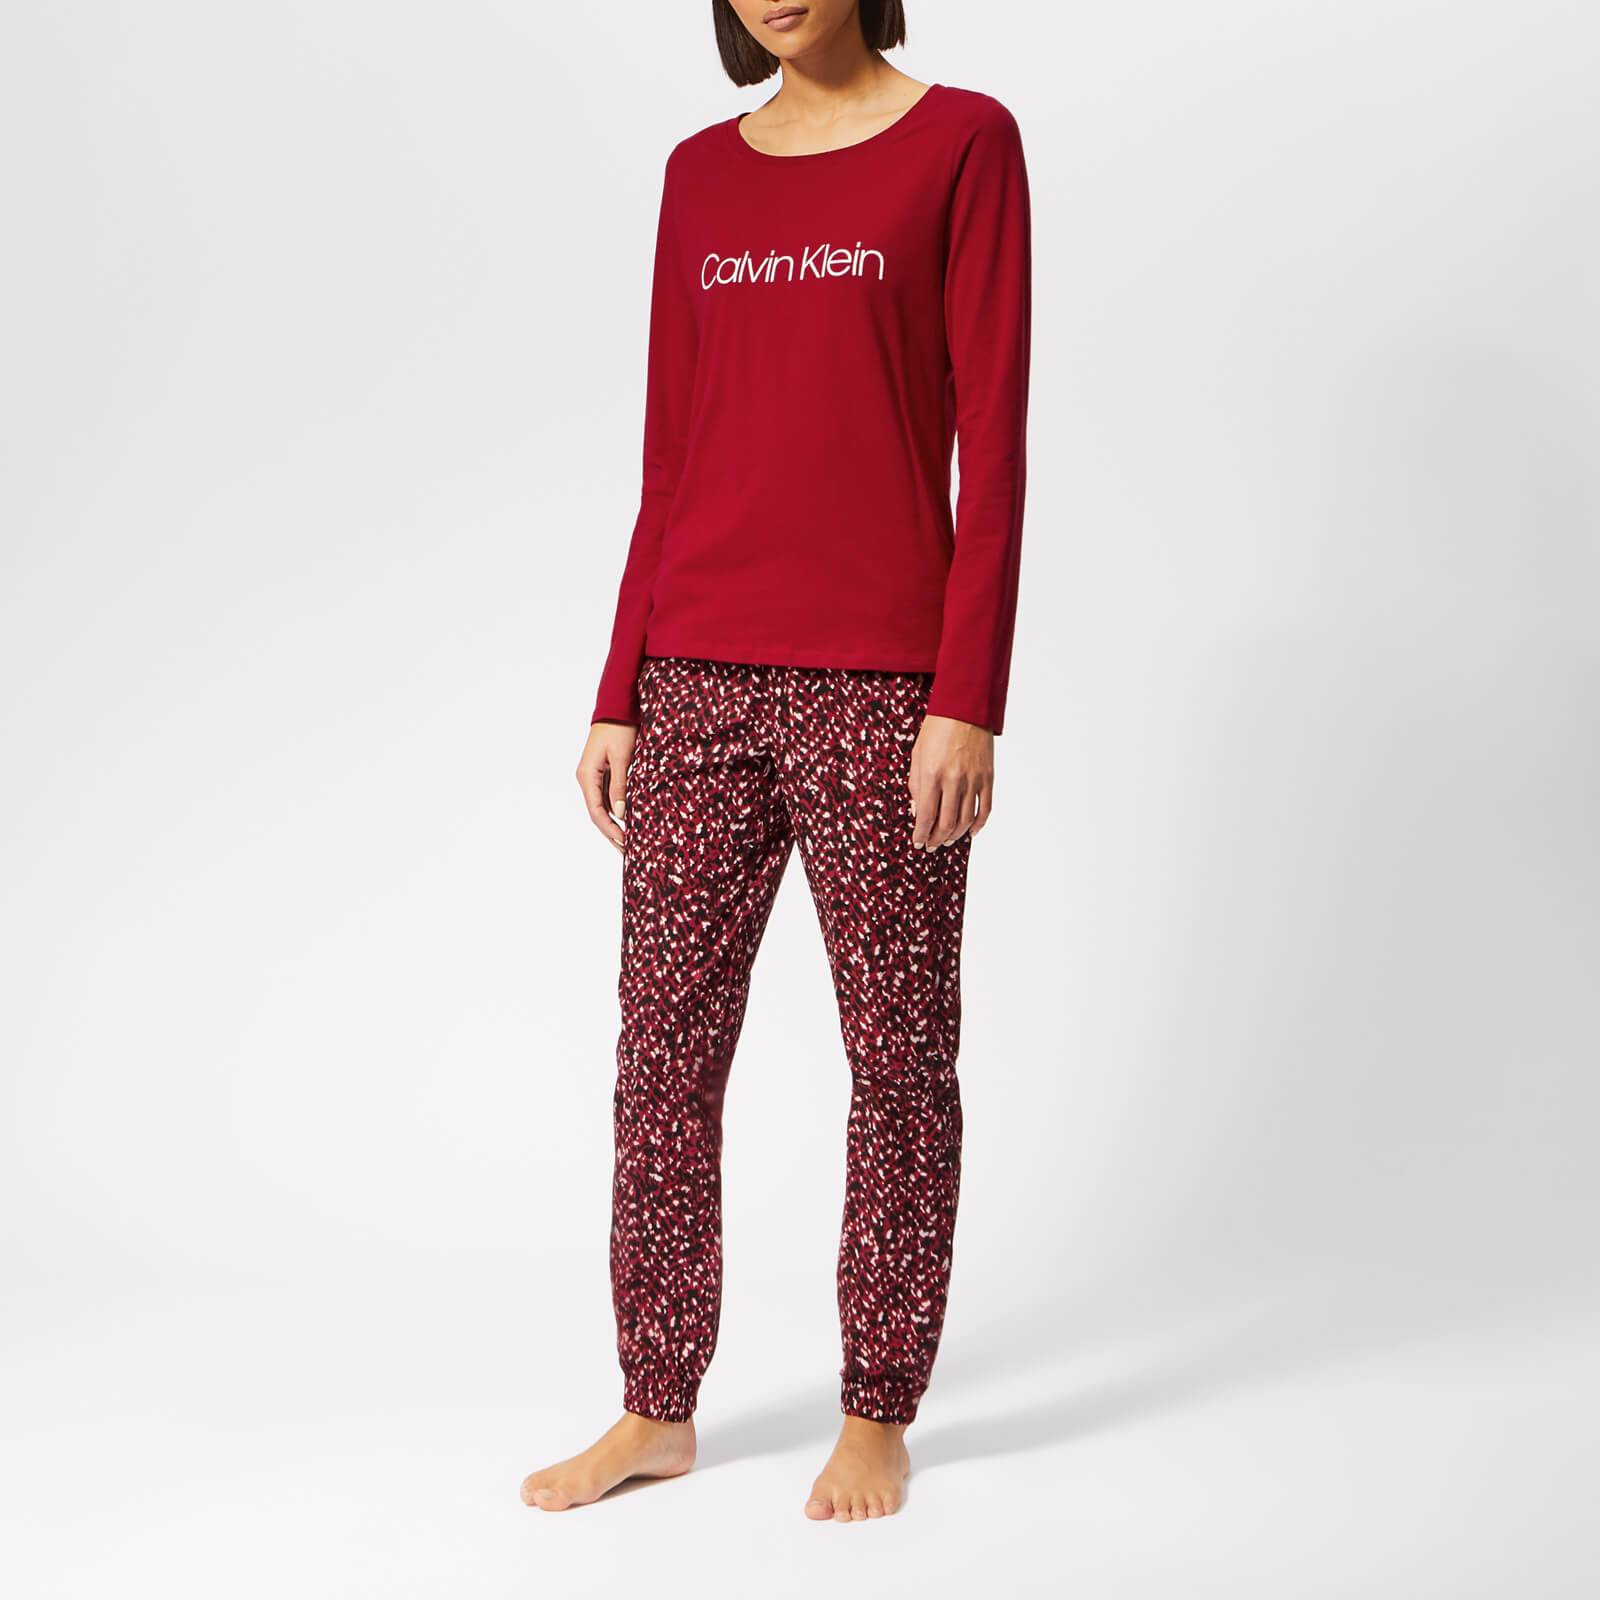 Calvin Klein Women's PJ Gift Set - Red - L - Red